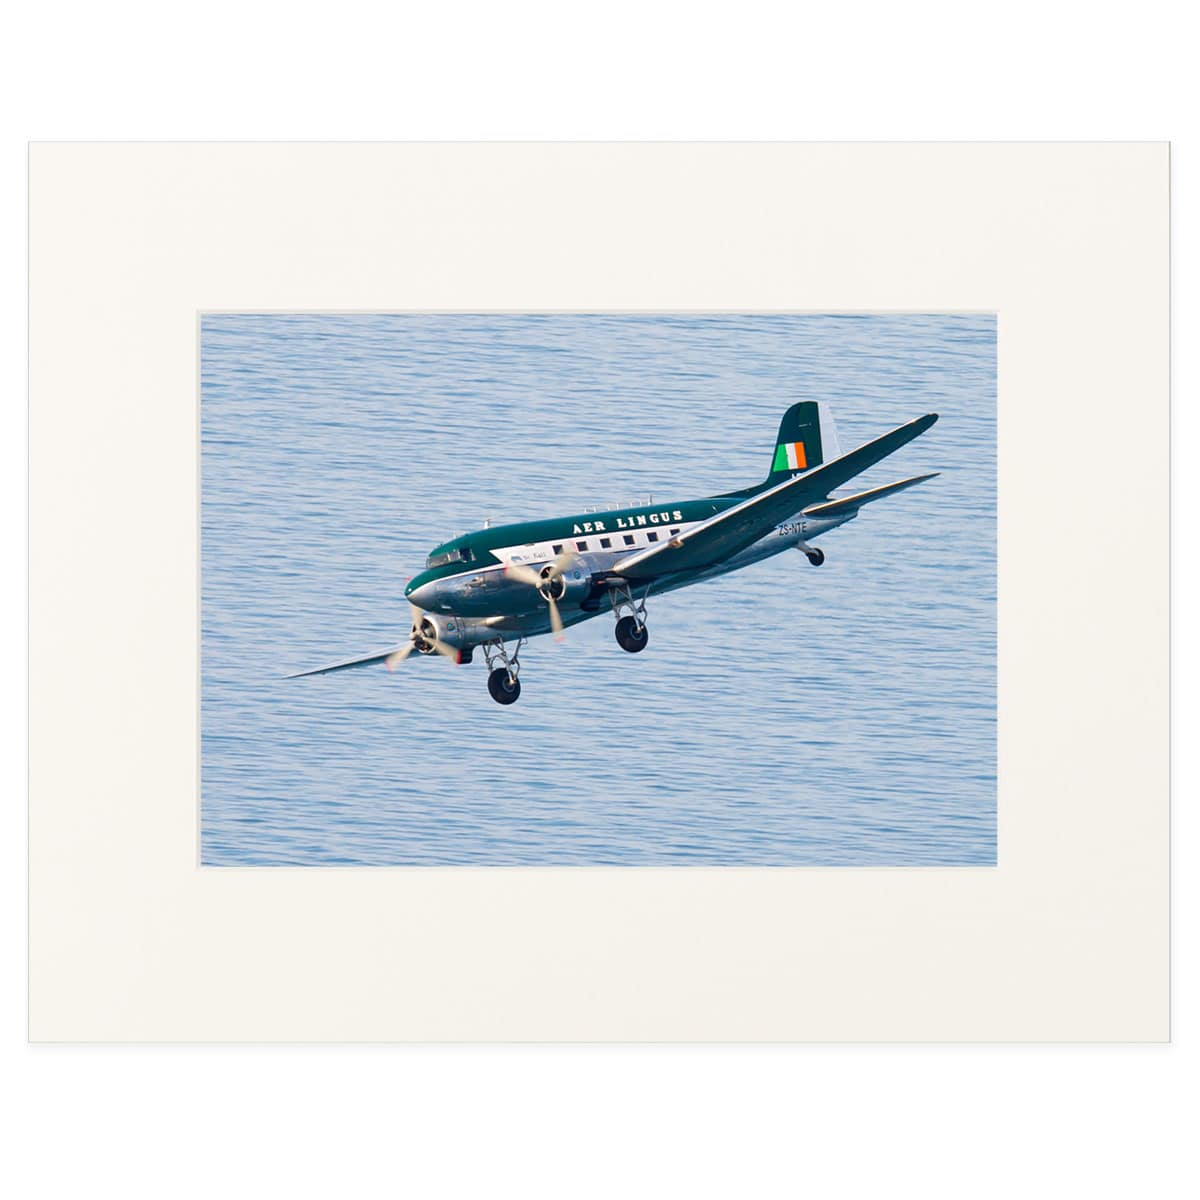 "Douglas DC3 in Aer Lingus livery 11"" x 14"" print"